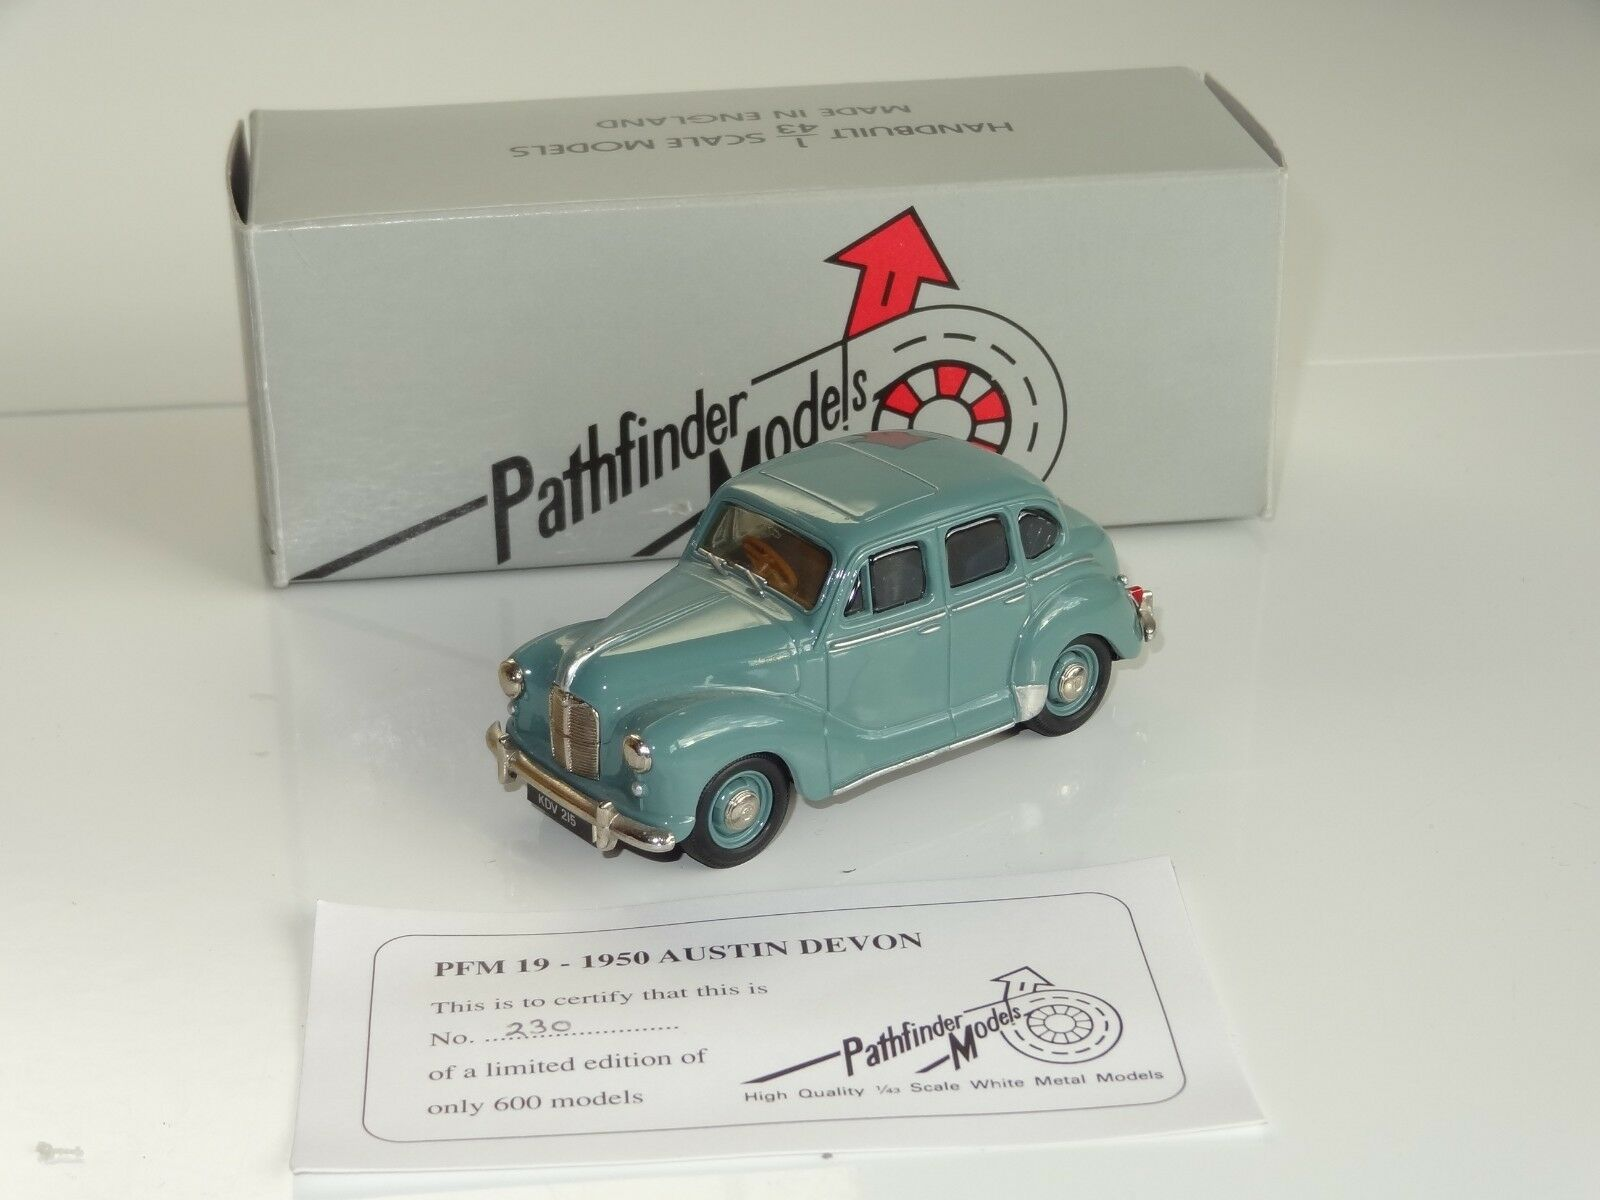 (EB)  Pathfinder white metal AUSTIN DEVON 1950 - PFM 19